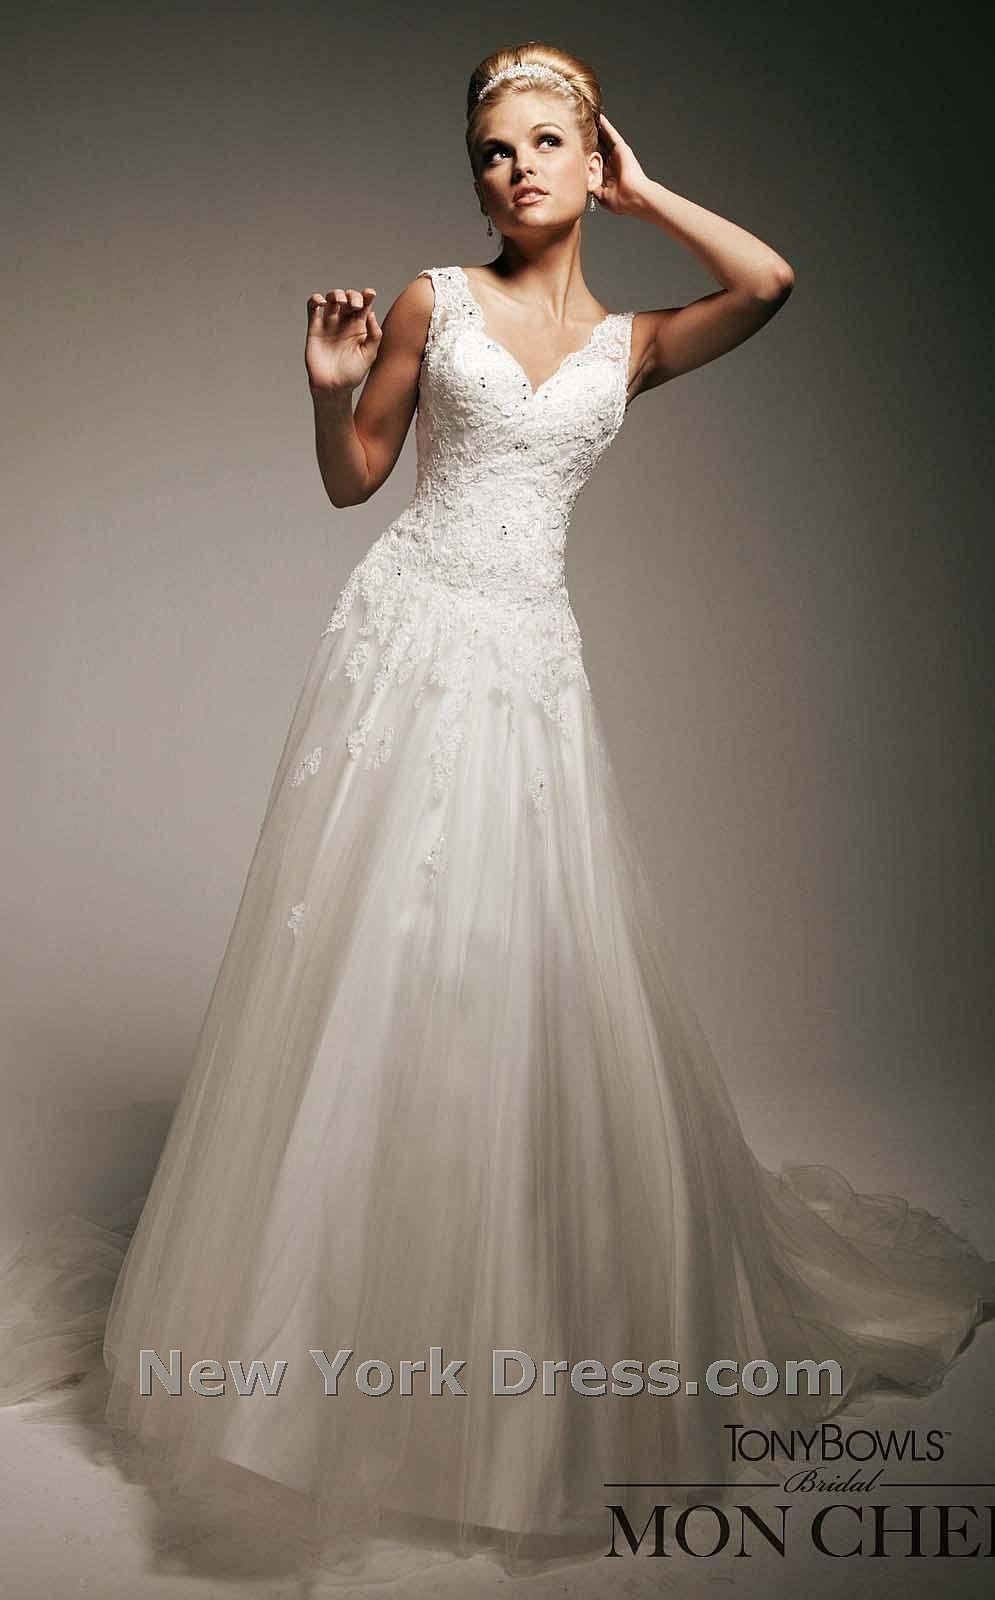 Tony Bowls wedding gown | Wedding dresses | Pinterest | Schüsseln ...